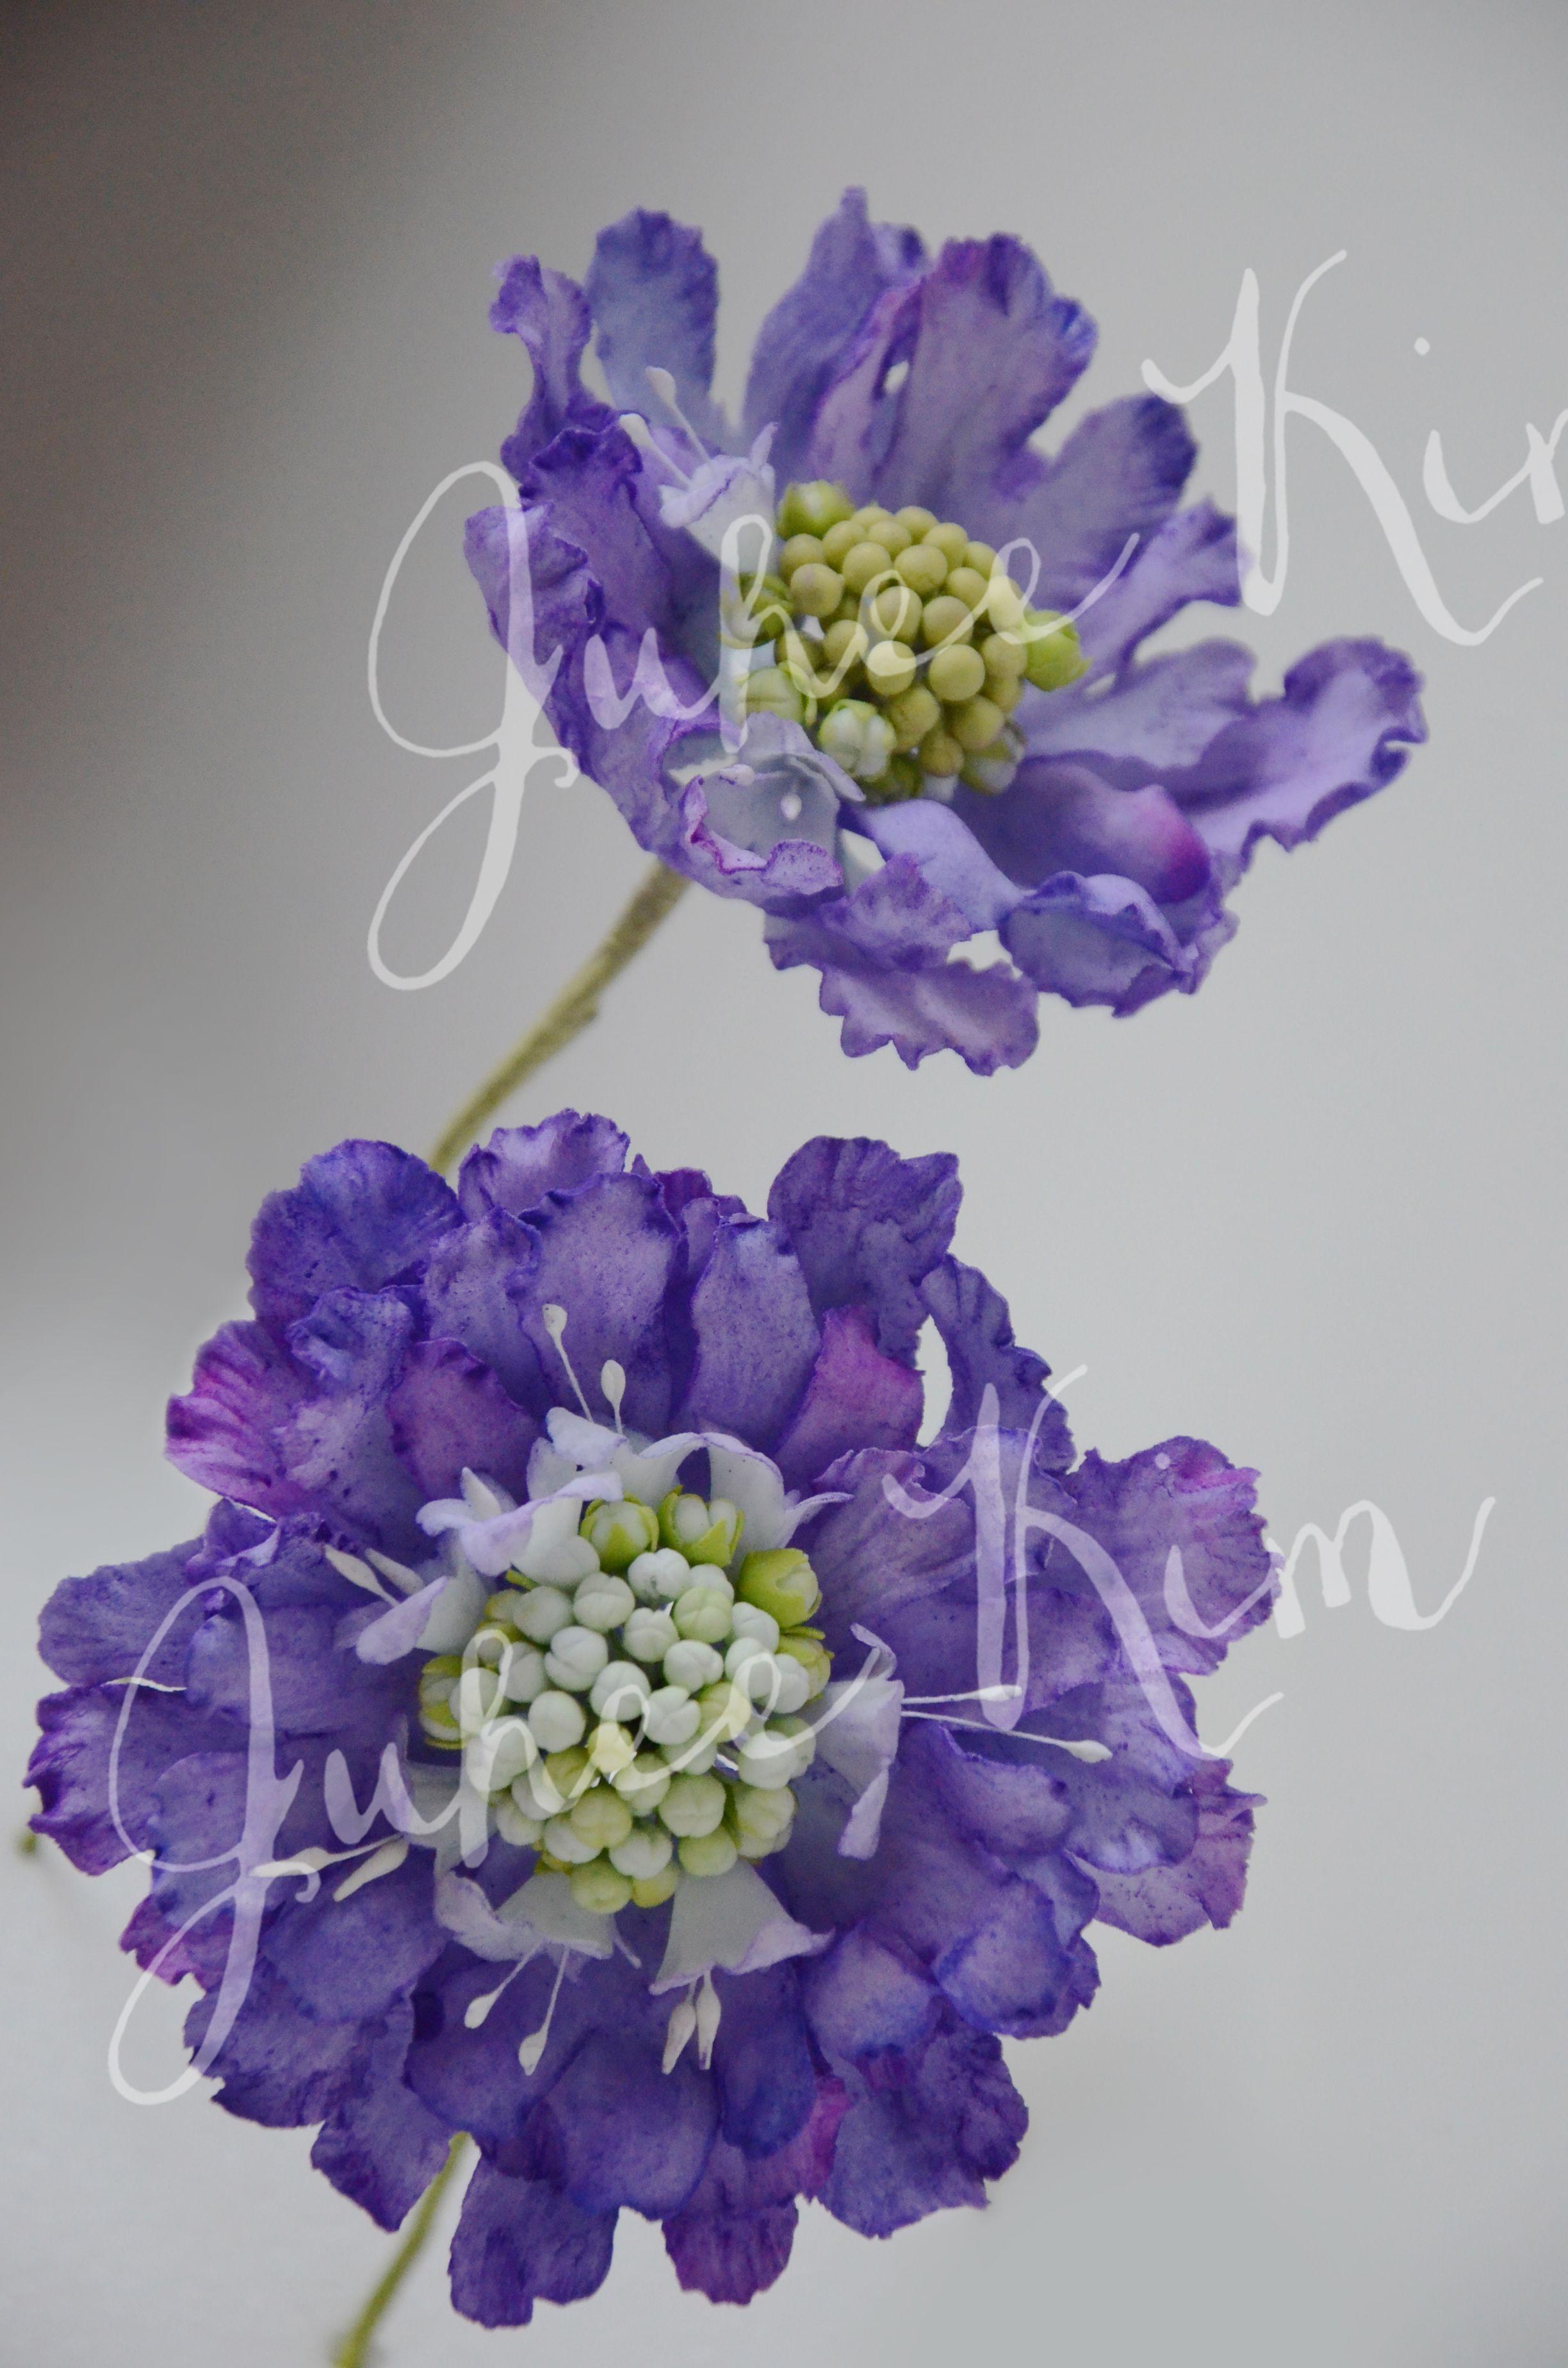 {2 Totally realistic sugar Scabiosa flowers by Juhee Kim}